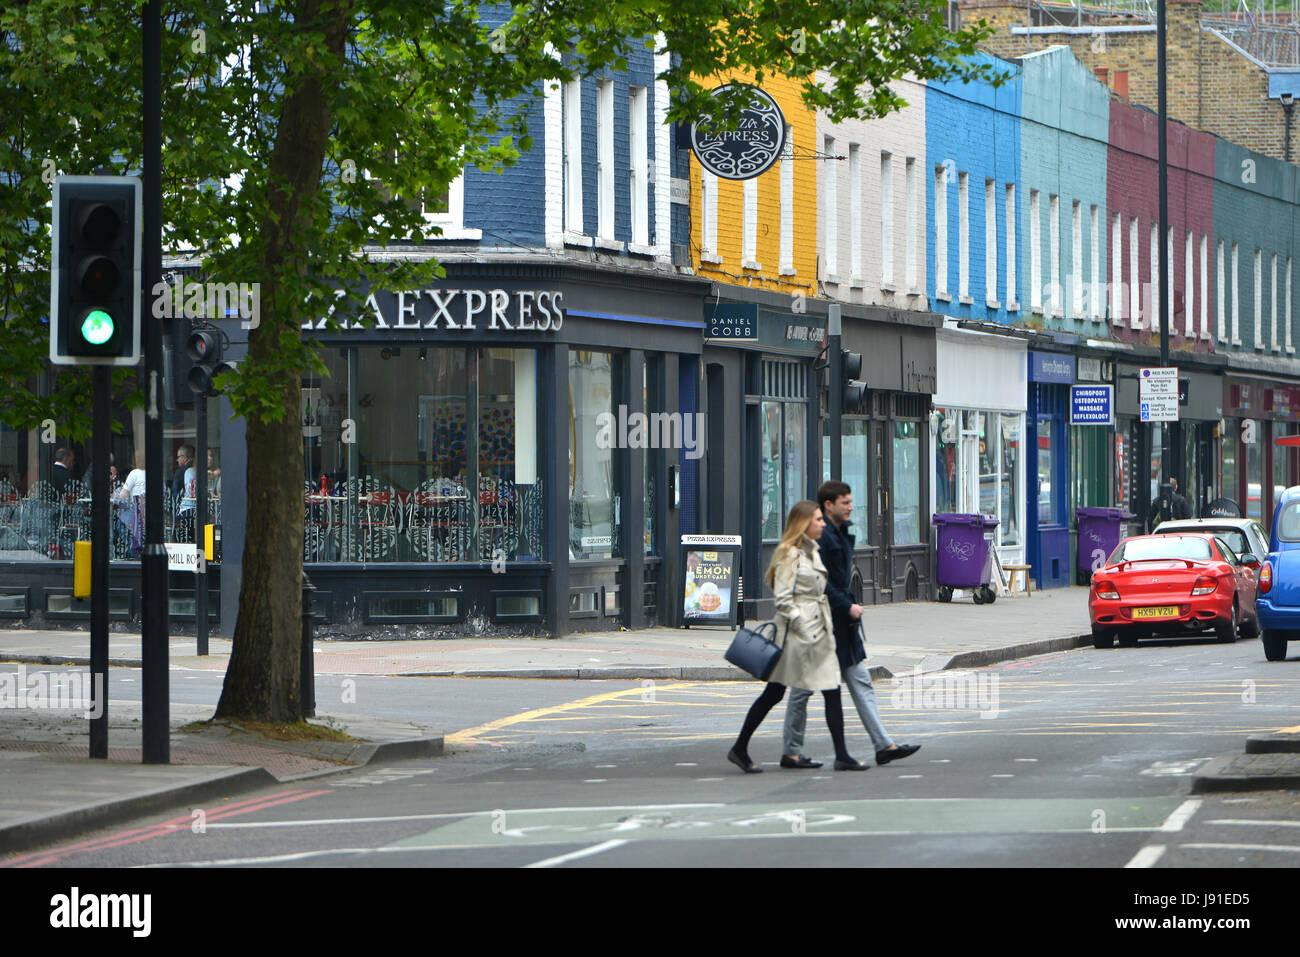 Colourful shops on Kennington Road, Lambeth, London. - Stock Image